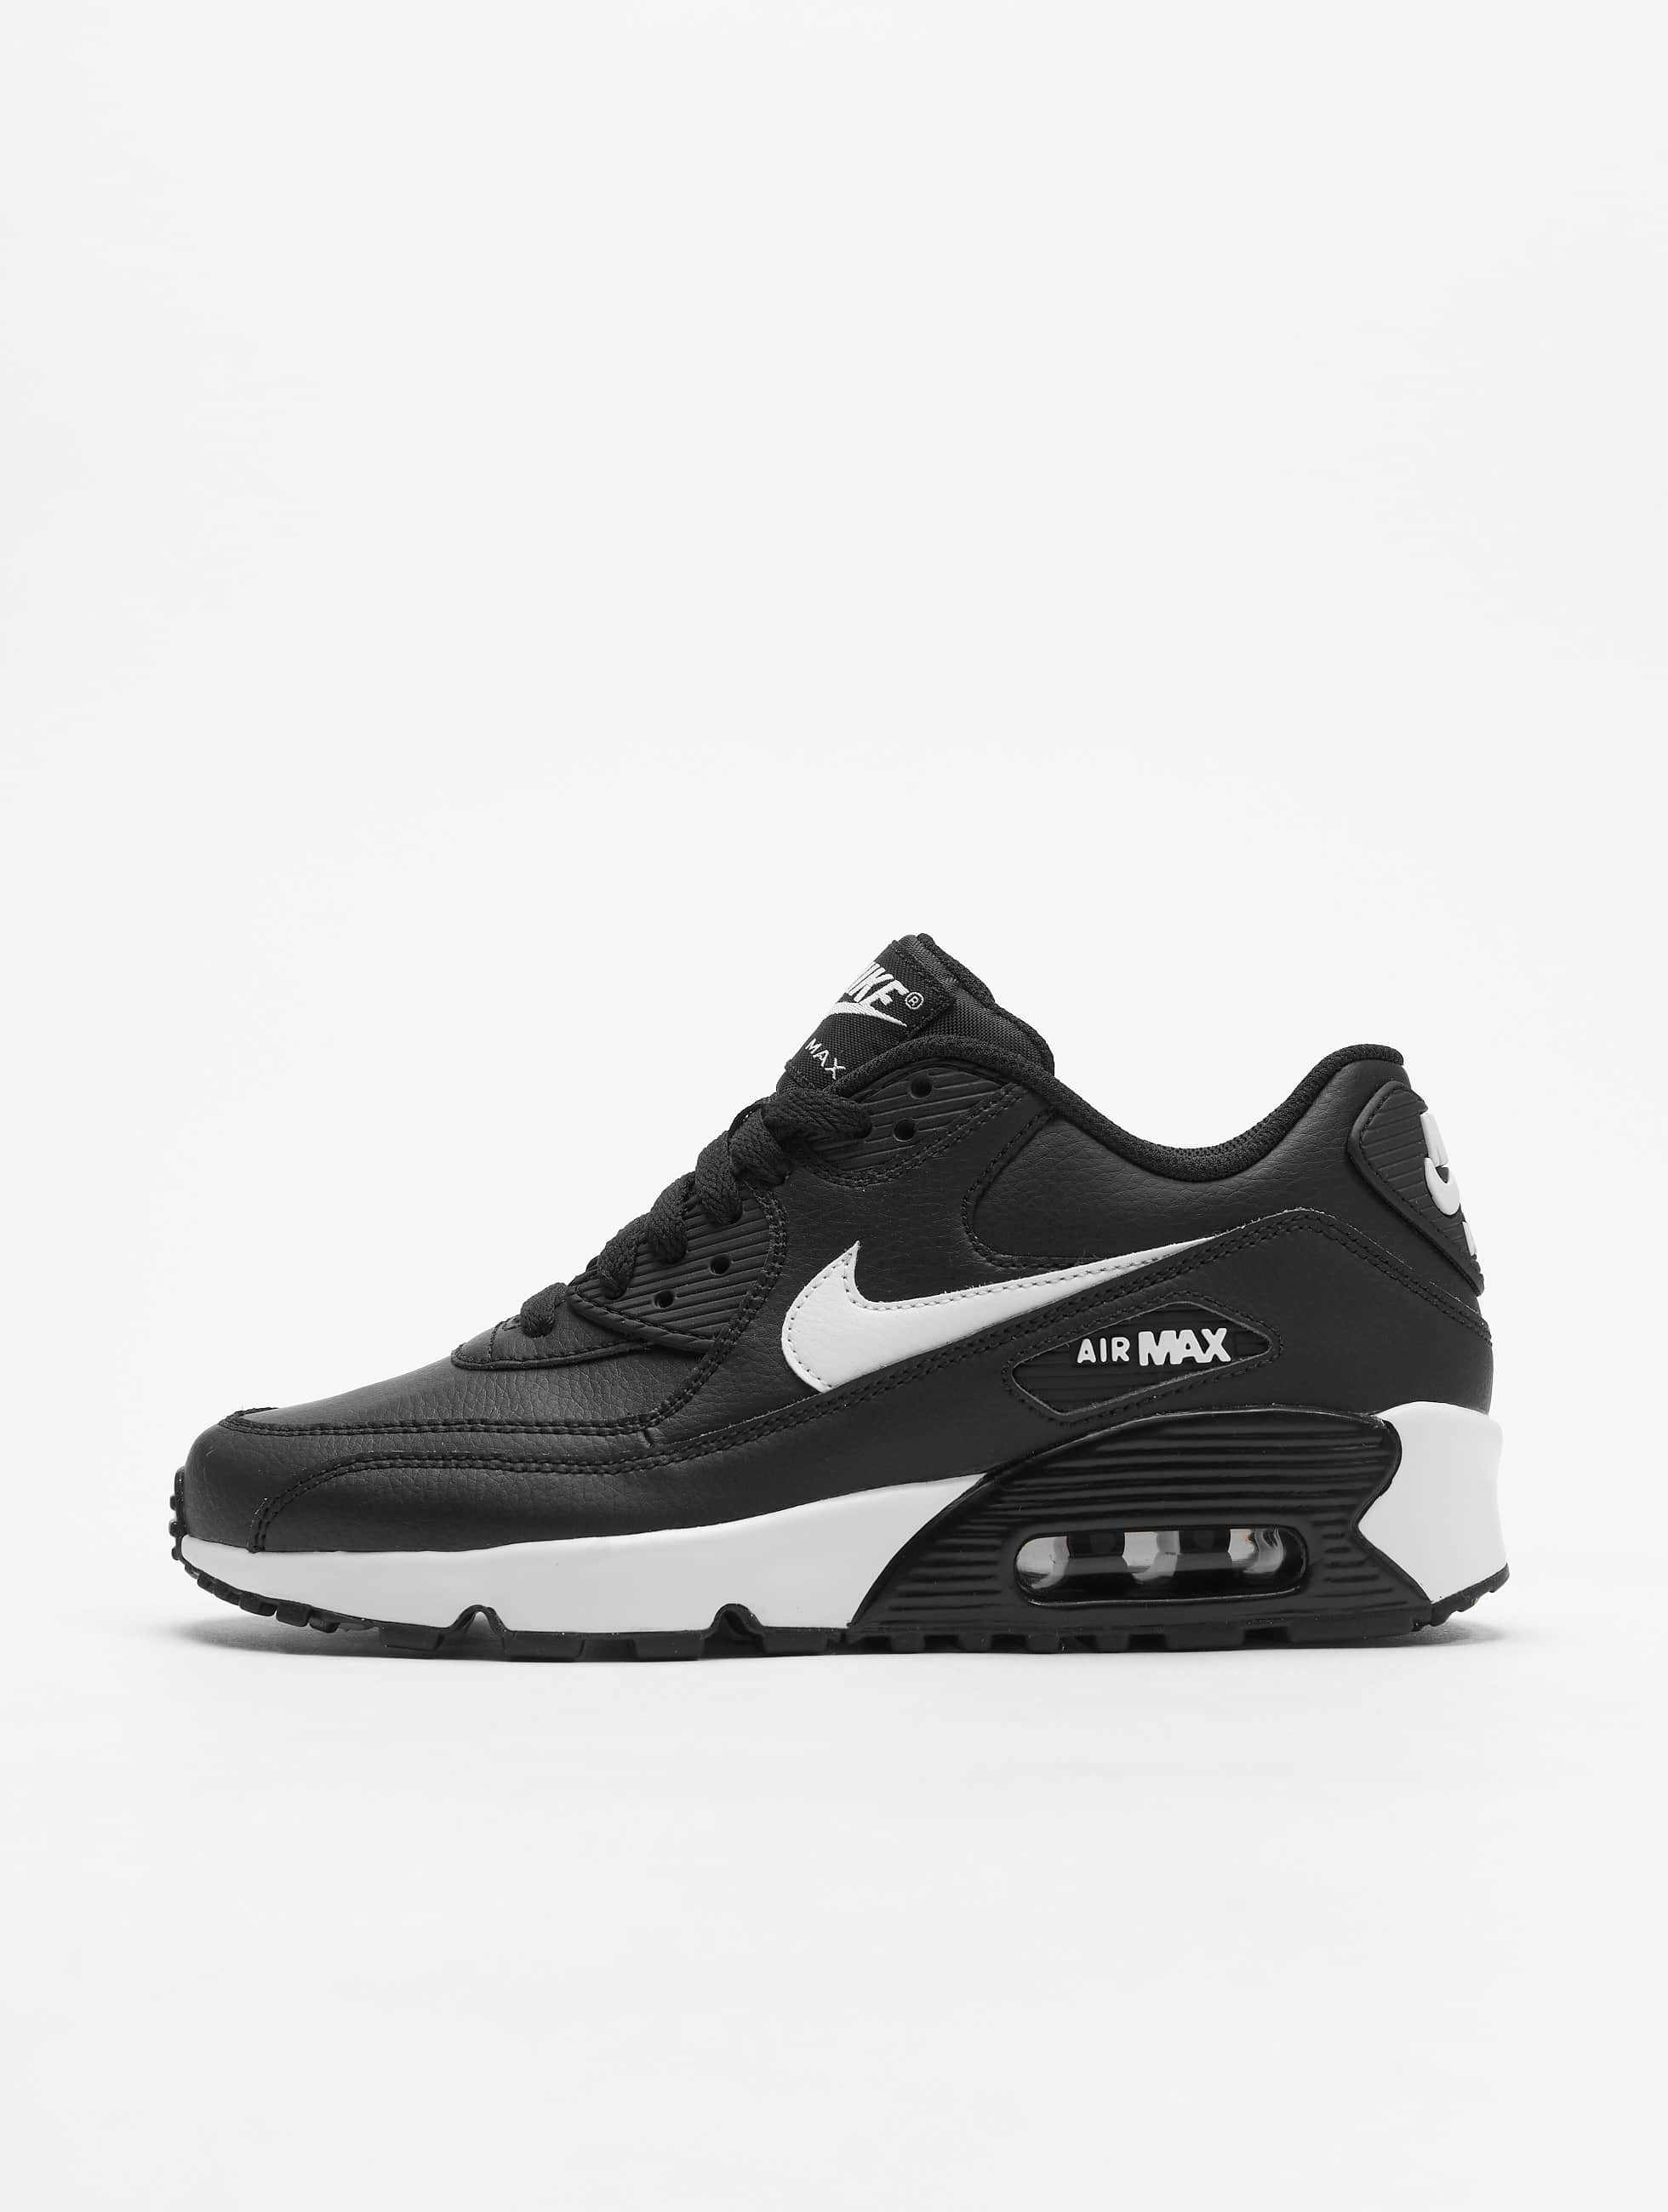 de42720c350 Nike schoen / sneaker Air Max 90 Leather in zwart 588256